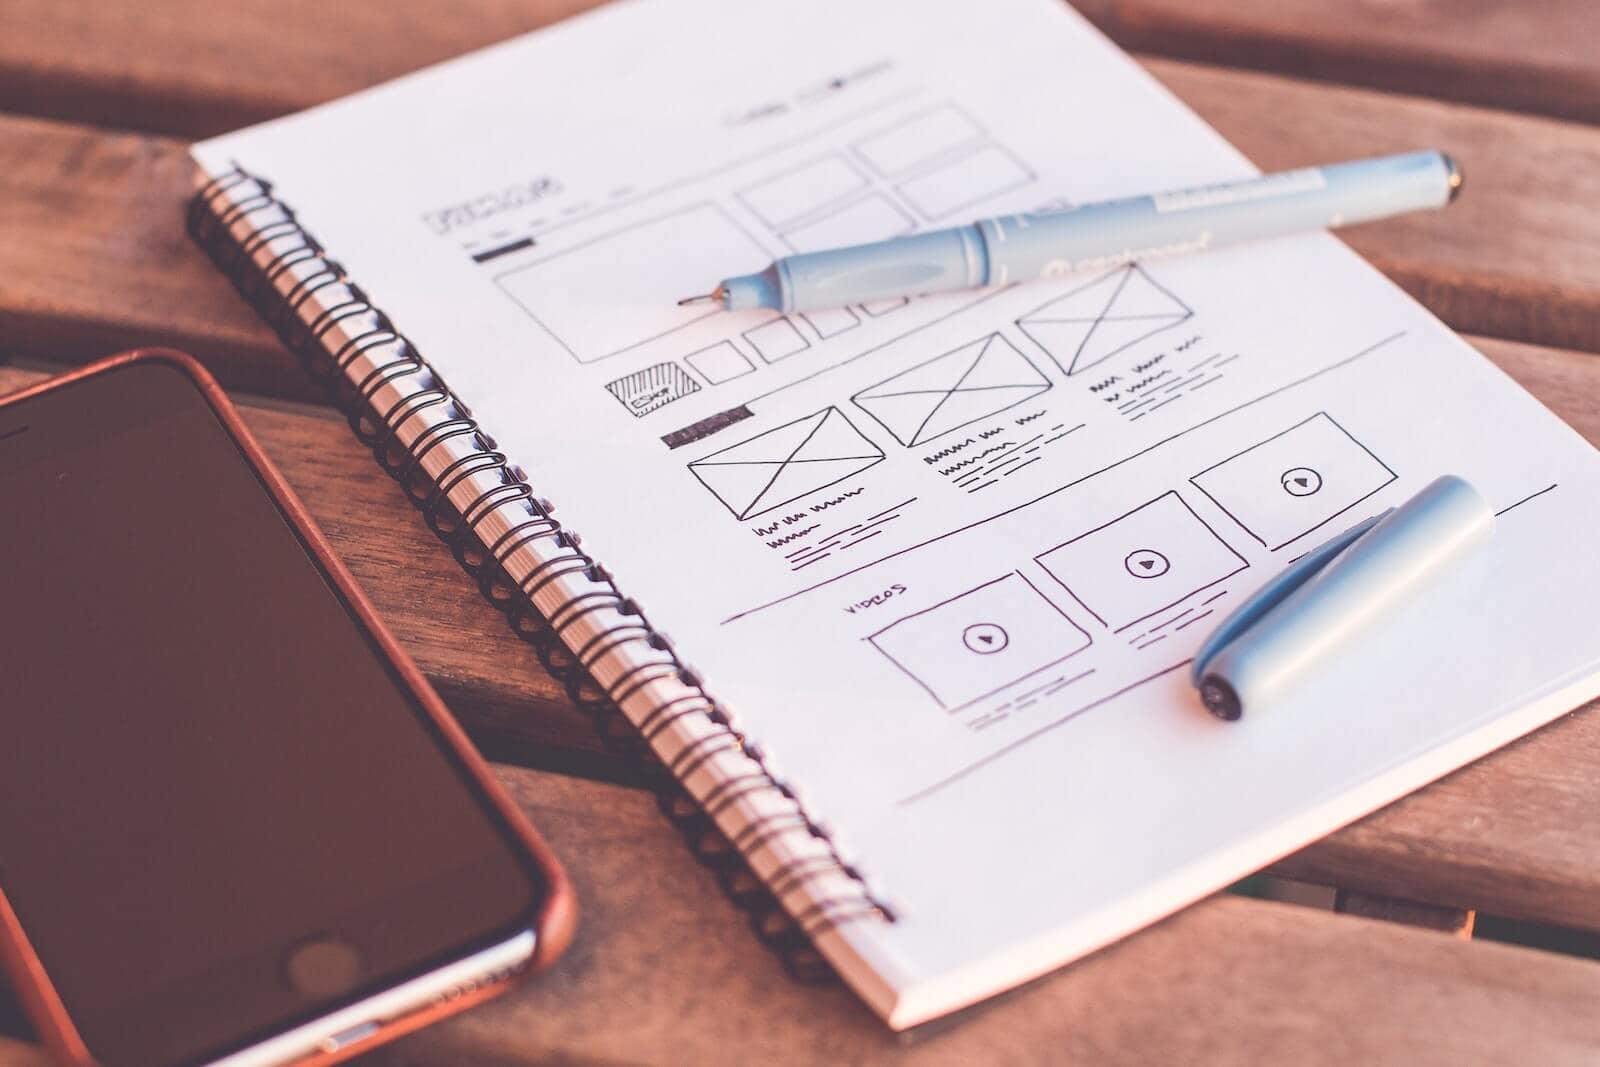 graphic designer desk with notebook sketches